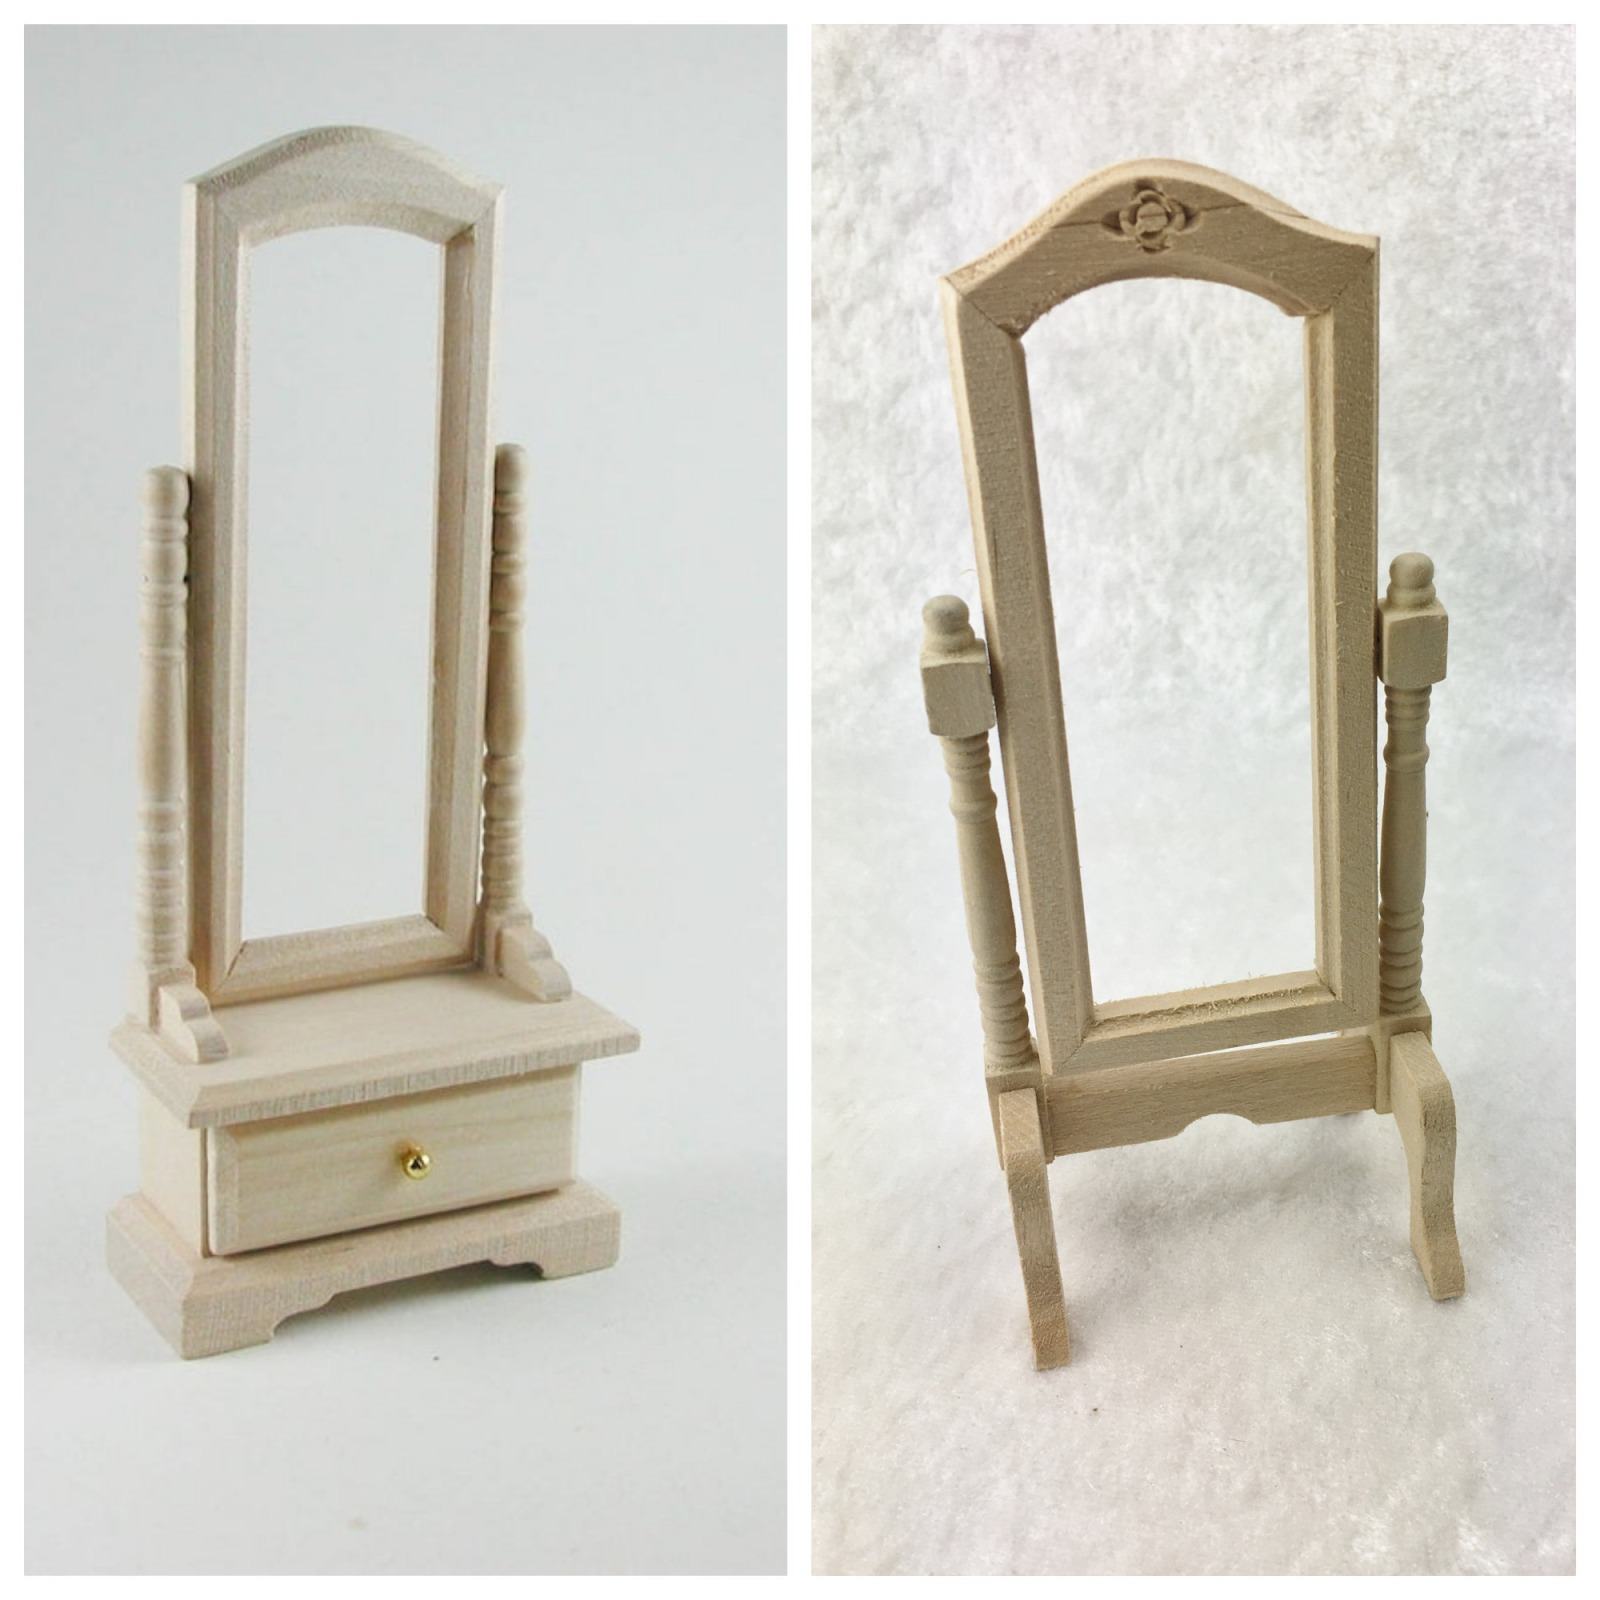 Standspiegel 1:12 Miniatur